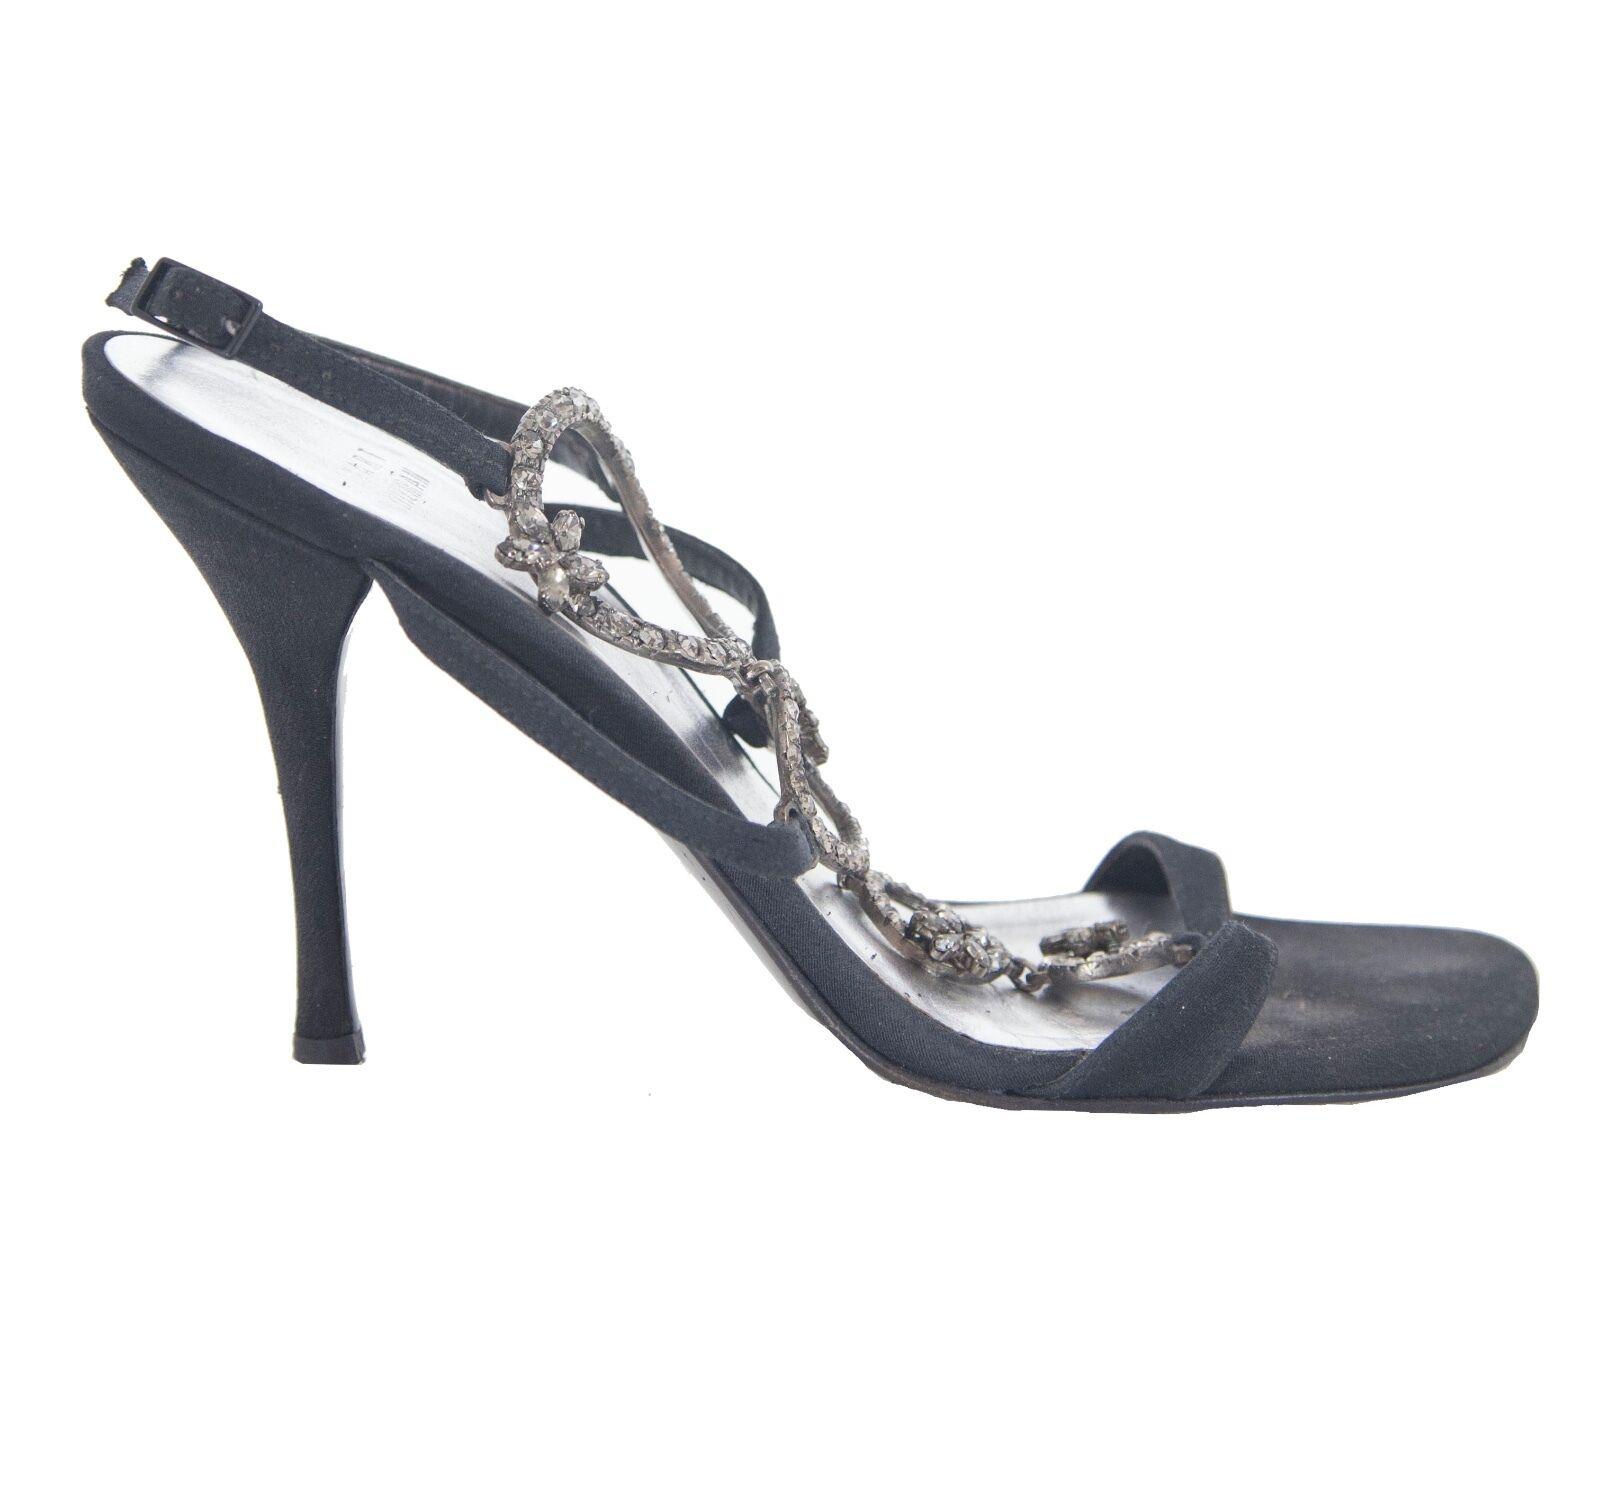 Stuart Weitzman nero satin open-toe sandals with crystal detail Dimensione 6.5